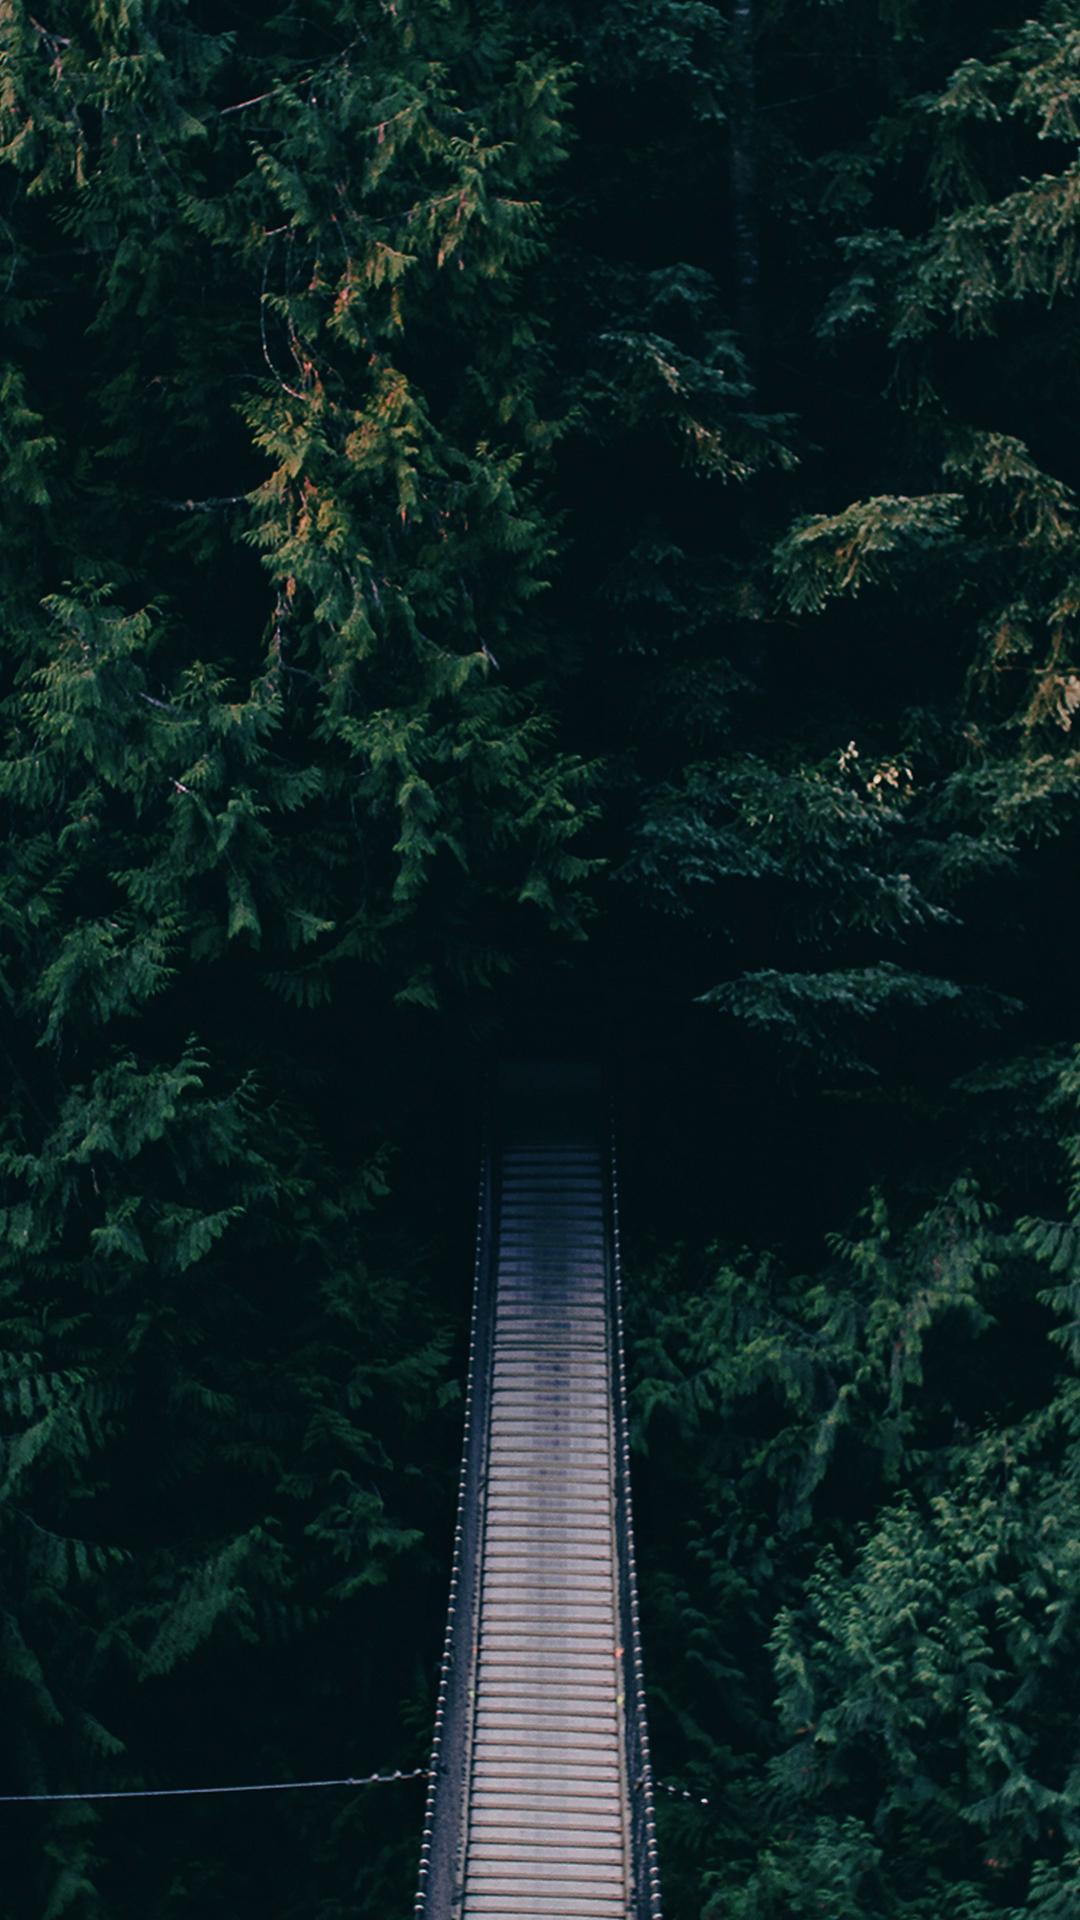 Suspended Forest Bridge iPhone 6 Plus HD Wallpaper